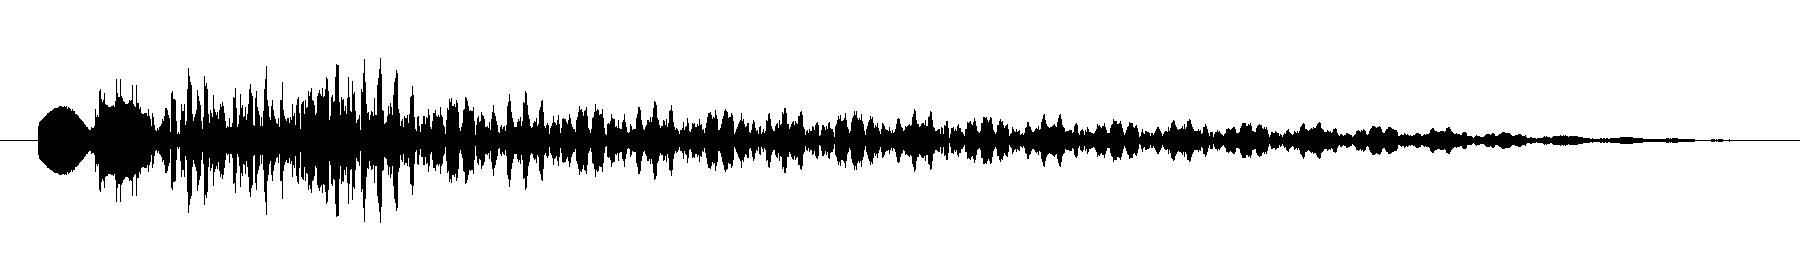 perc 1 9